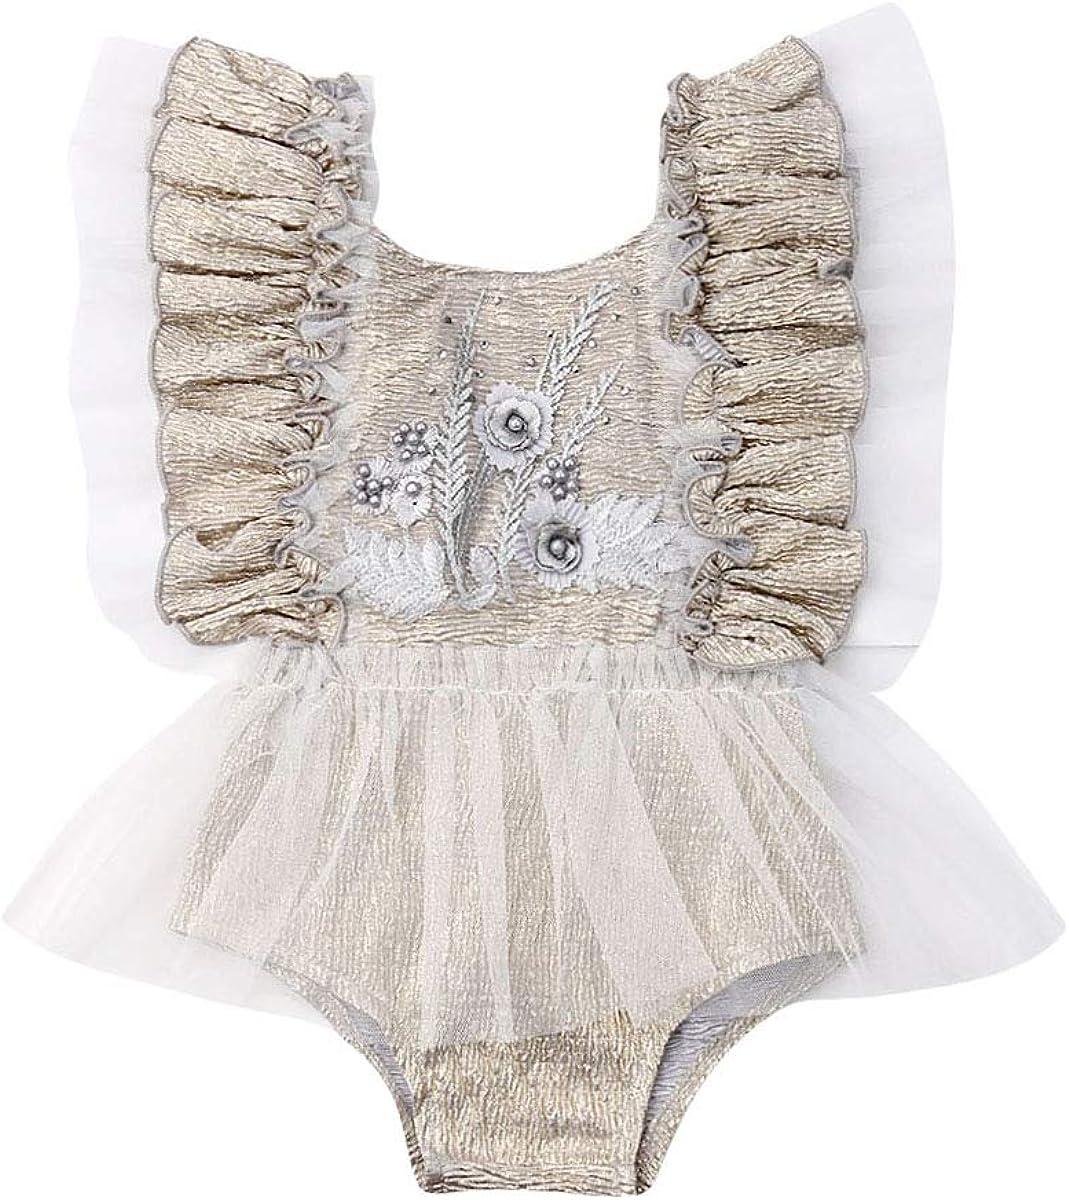 Ambabe Newborn Baby Girl Romper White Long Sleeves//Ruffle Sleeveless Lace Floral Tutu Dress Bodysuit Outfits